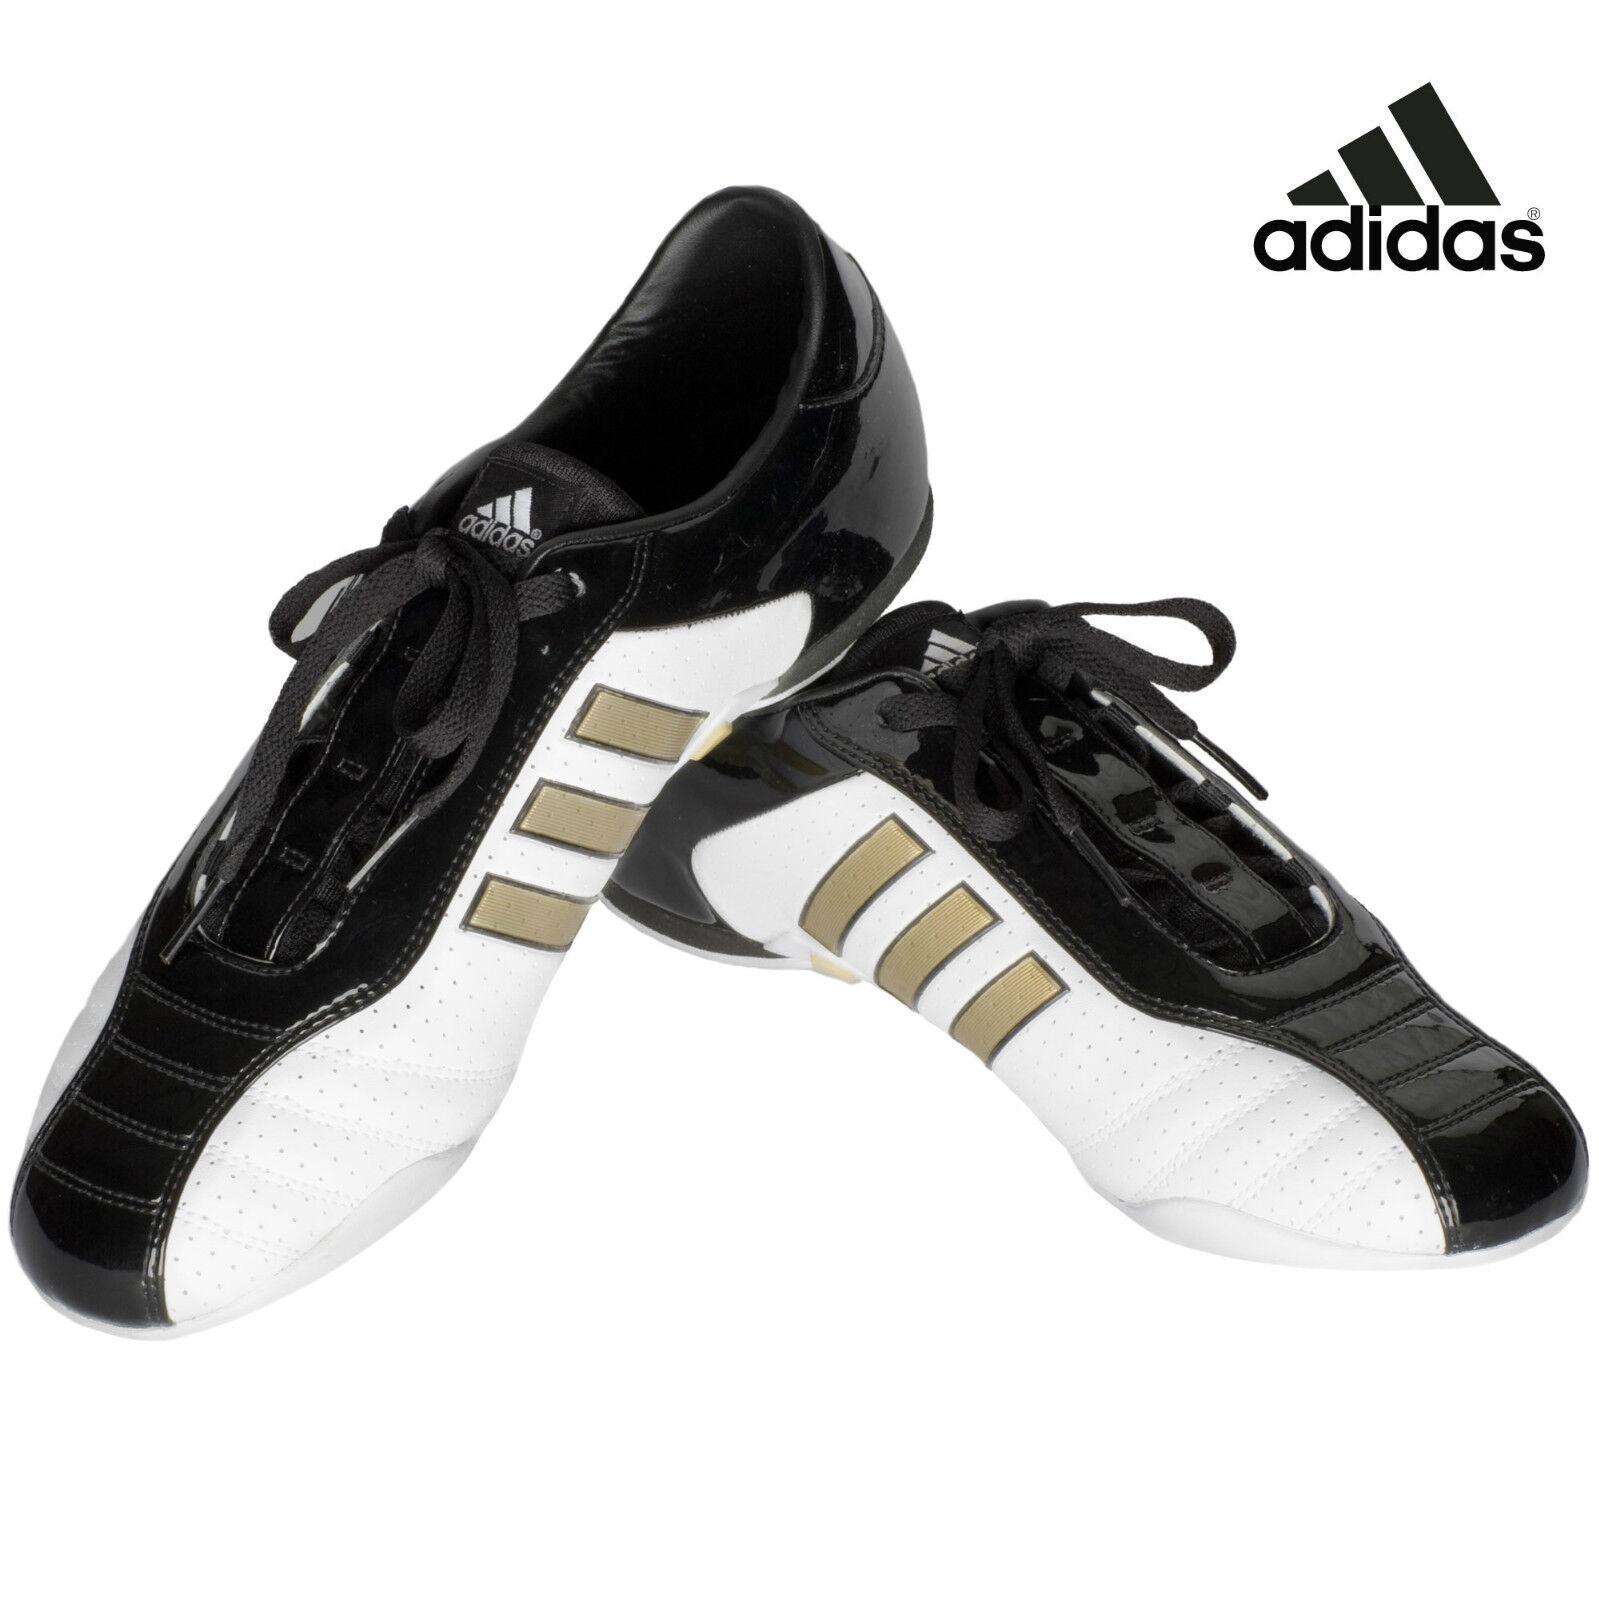 Adidas Taekwondo Karatedo shoes Indoor shoes Evolution II US Size7(25.0cm)